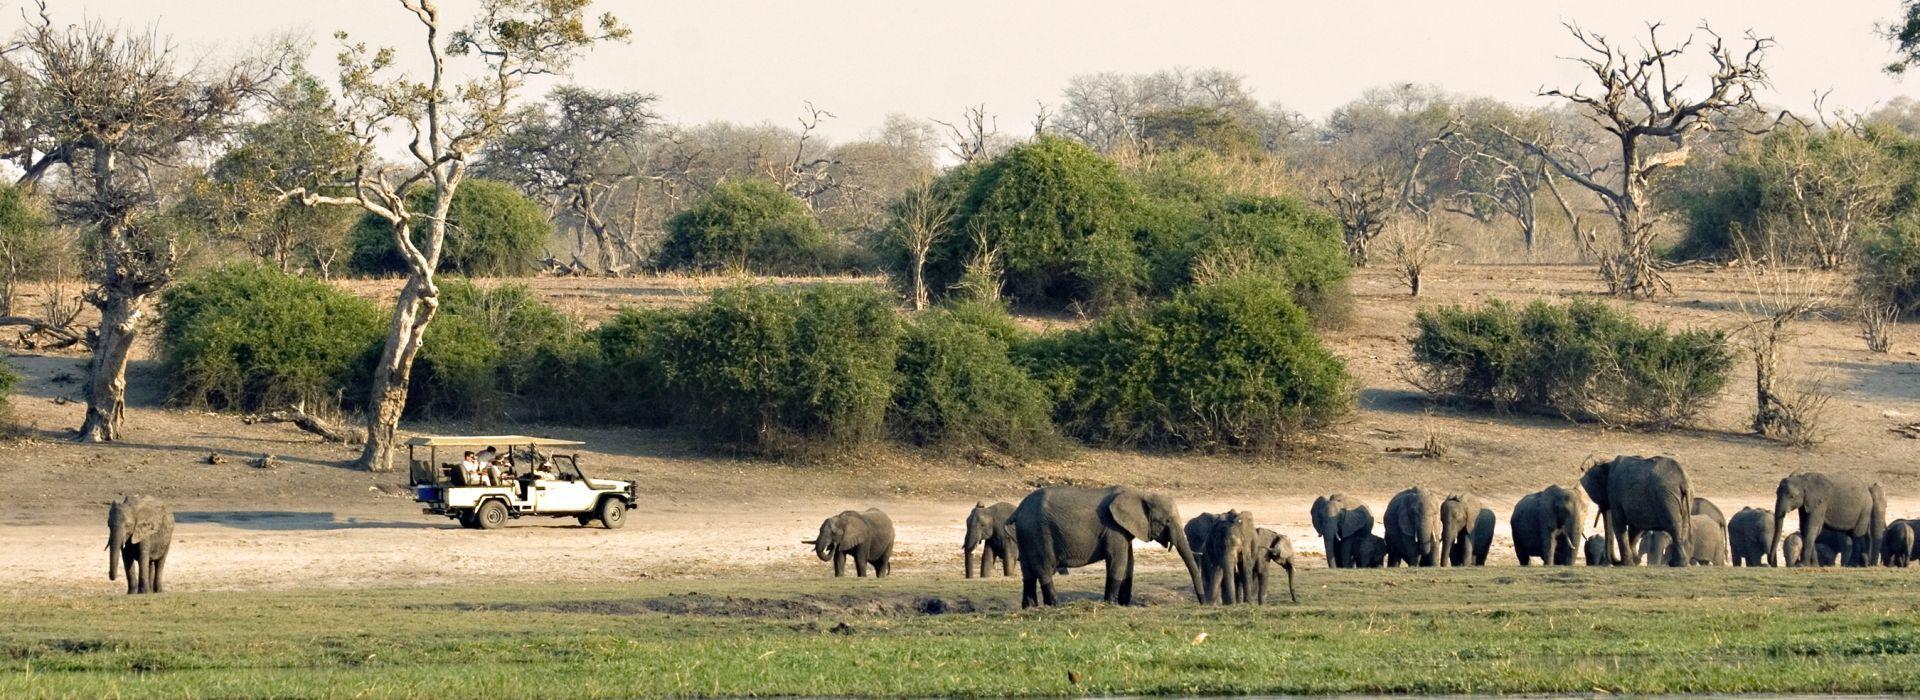 Chobe National Park Tours